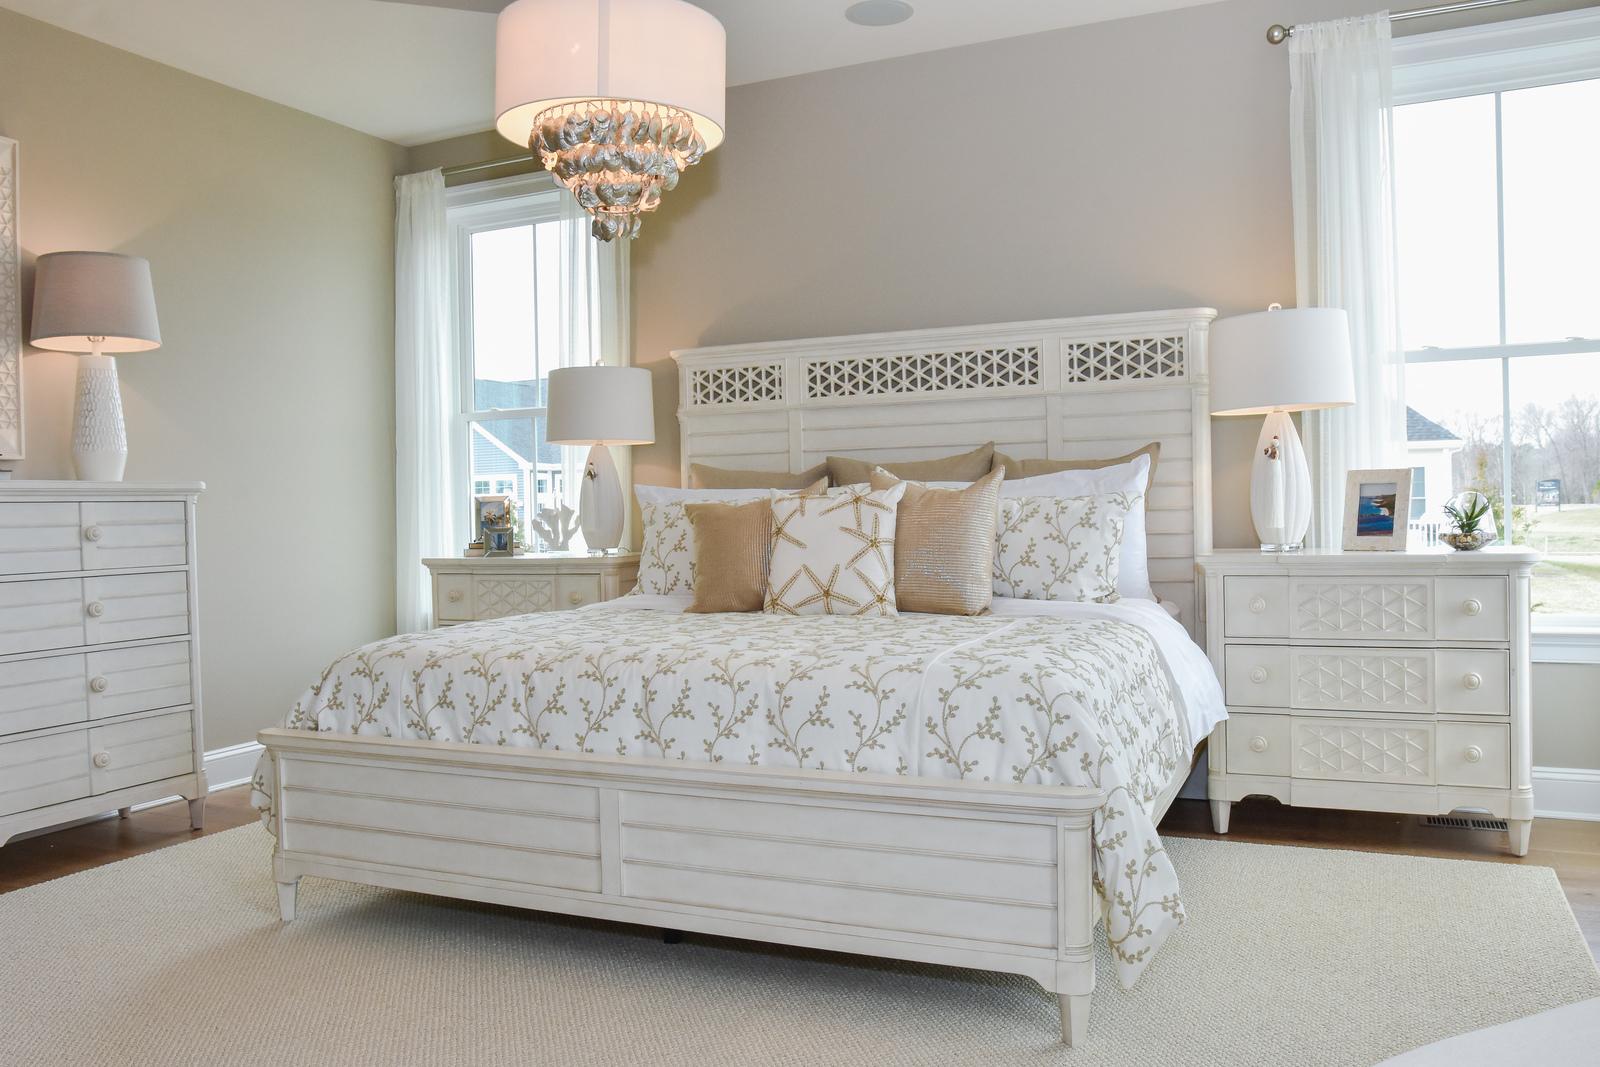 New Ocean Breeze Home Model For Sale